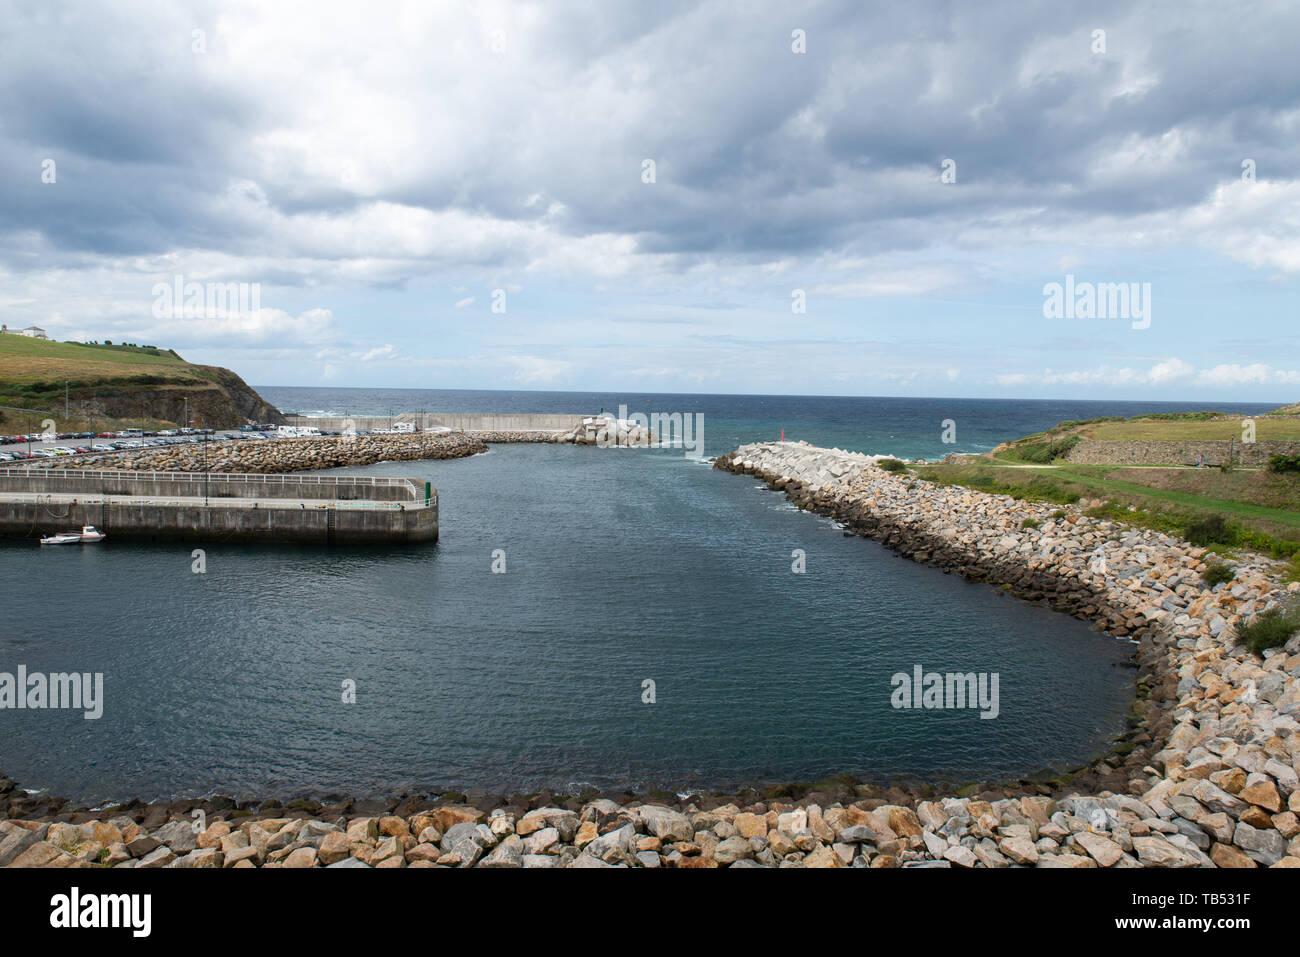 Manmade harbour - with blocks of concrete -, Puerto de Vega, Asturias, Spain. - Stock Image